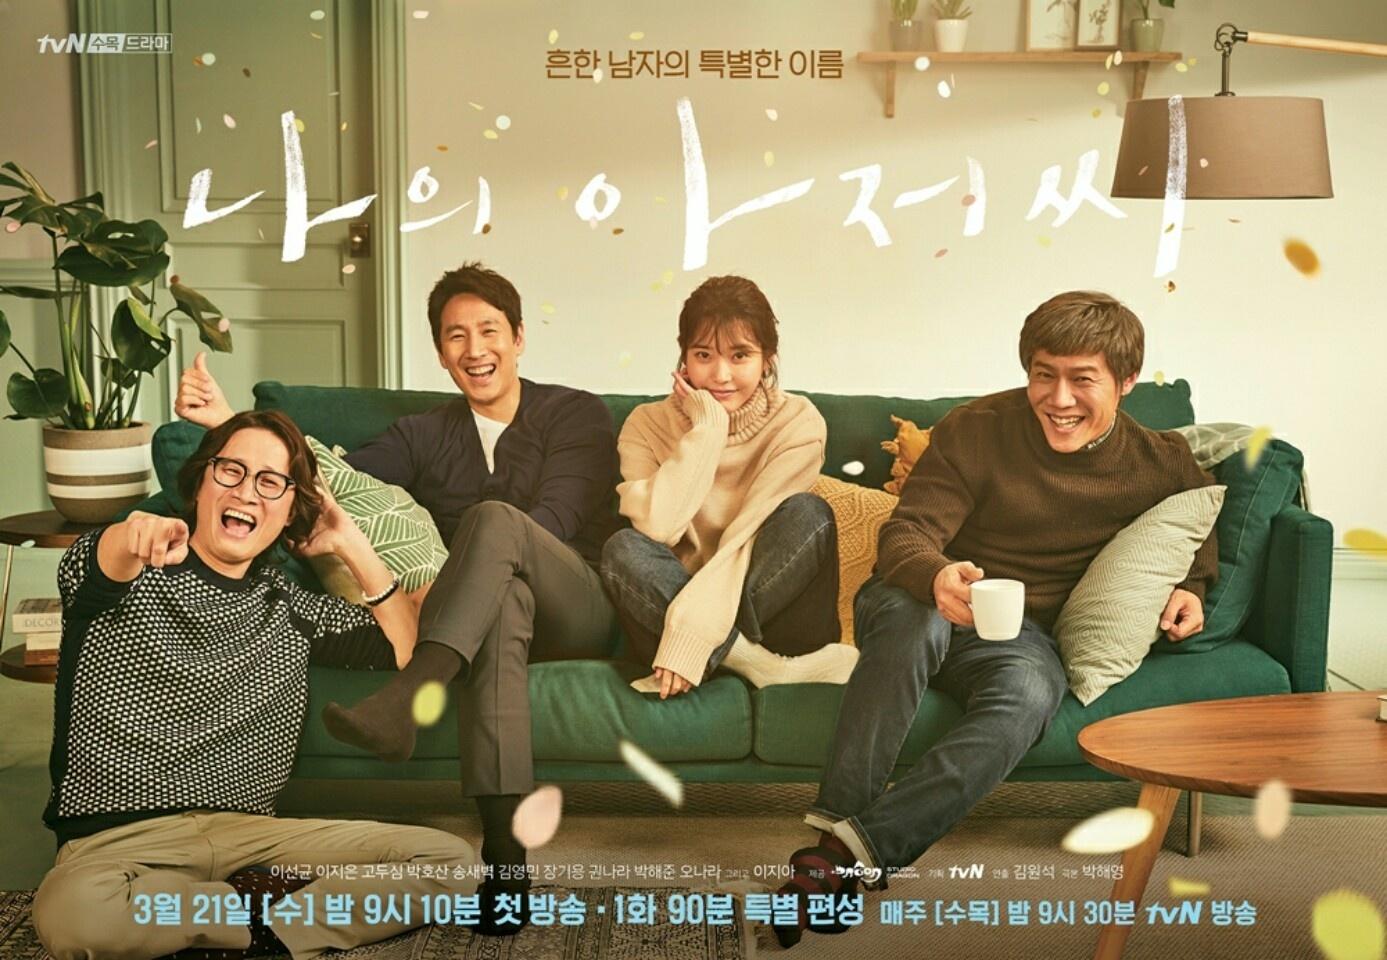 2018 Korean Drama Recommendations - DramaPanda